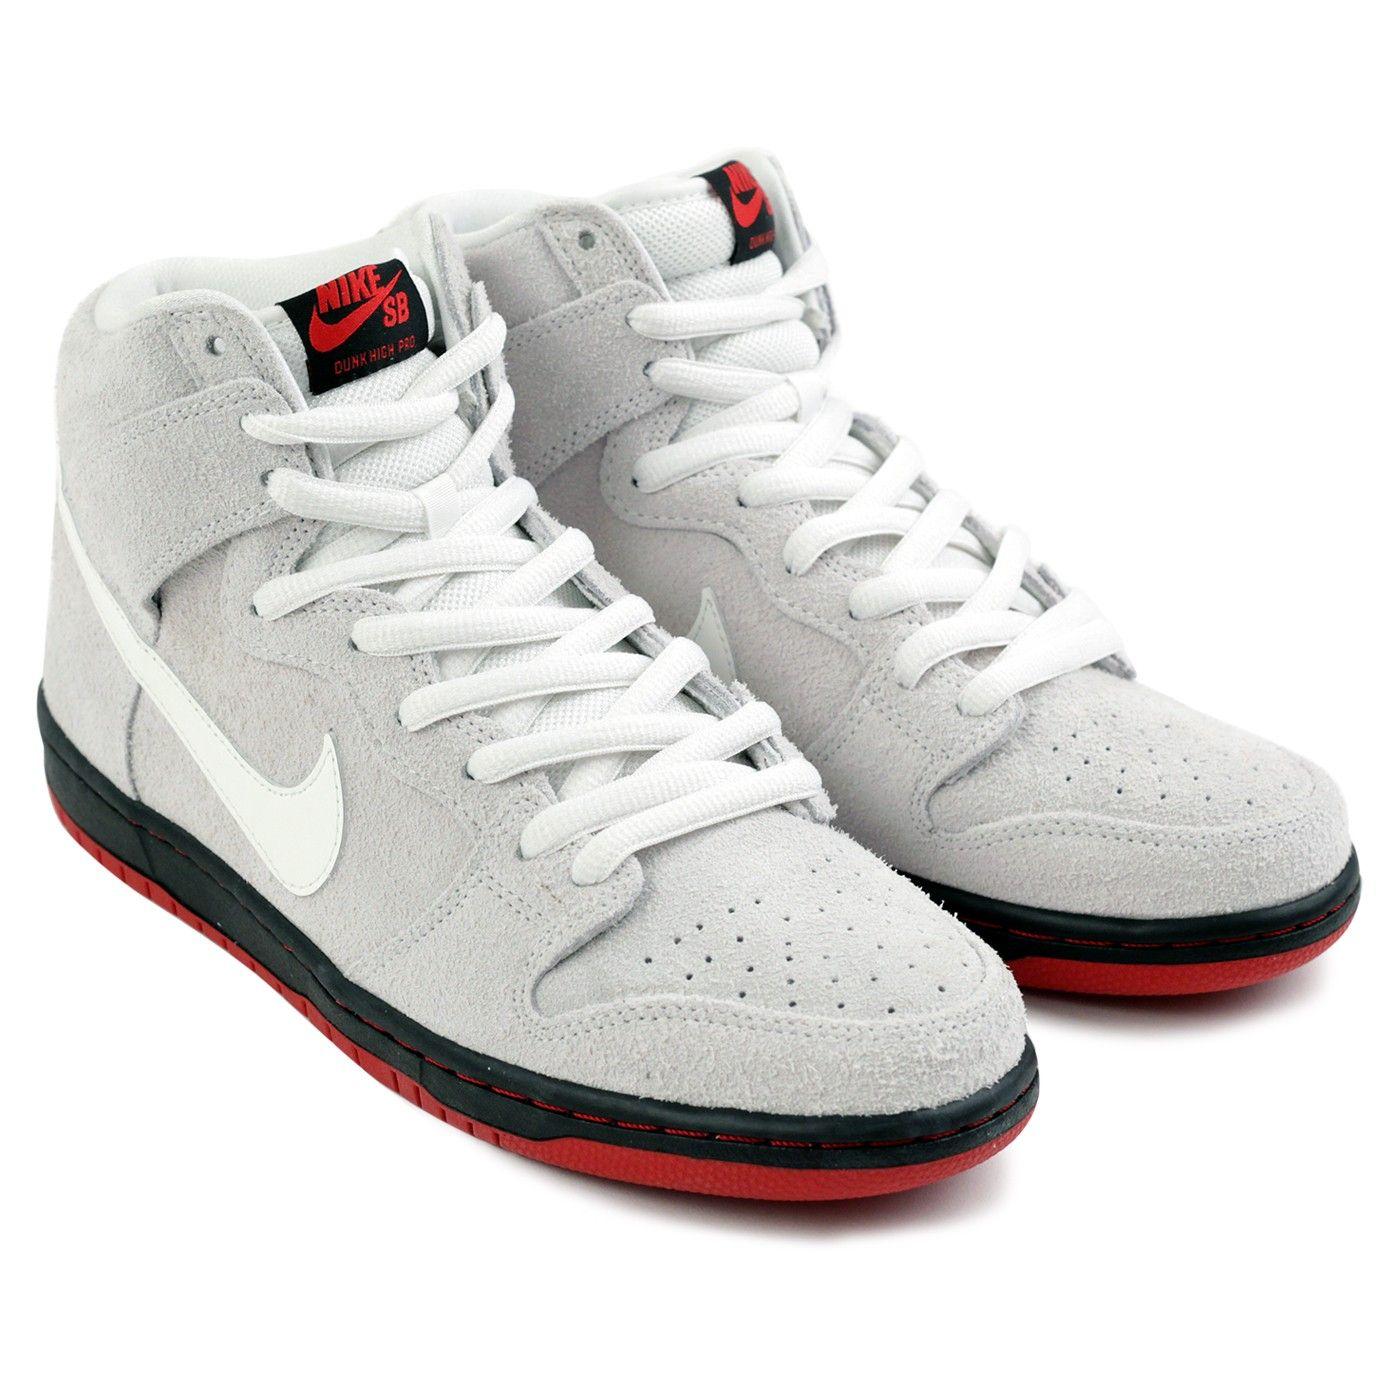 Dunk High TRD QS Black Sheep Shoes in Summit White   Summit White - Black  by Nike SB 110bb7e42